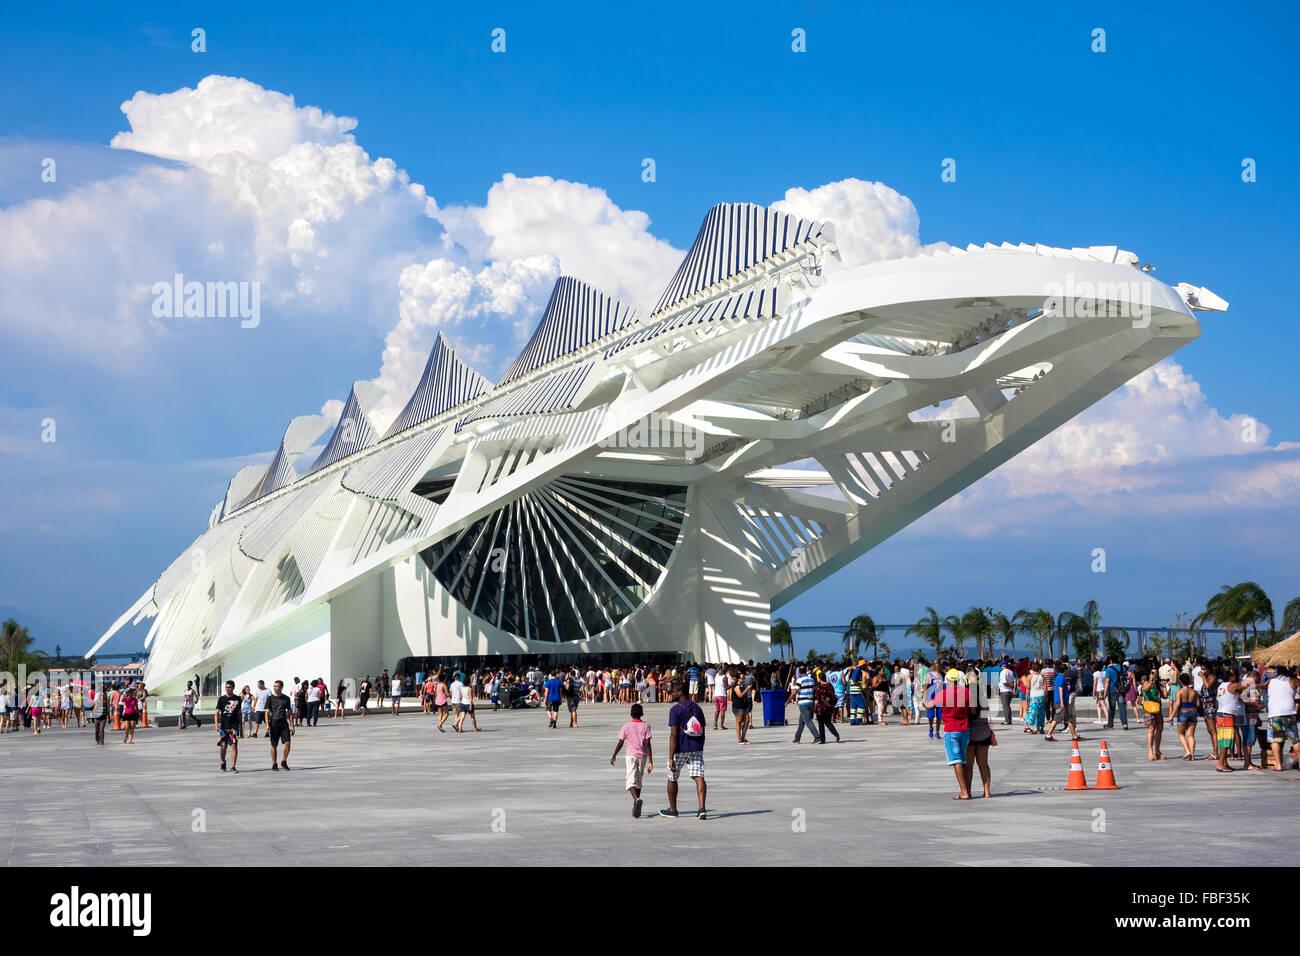 People visiting the Museum of Tomorrow, designed by Spanish architect Santiago Calatrava, in Rio de Janeiro, Brazil. - Stock Image